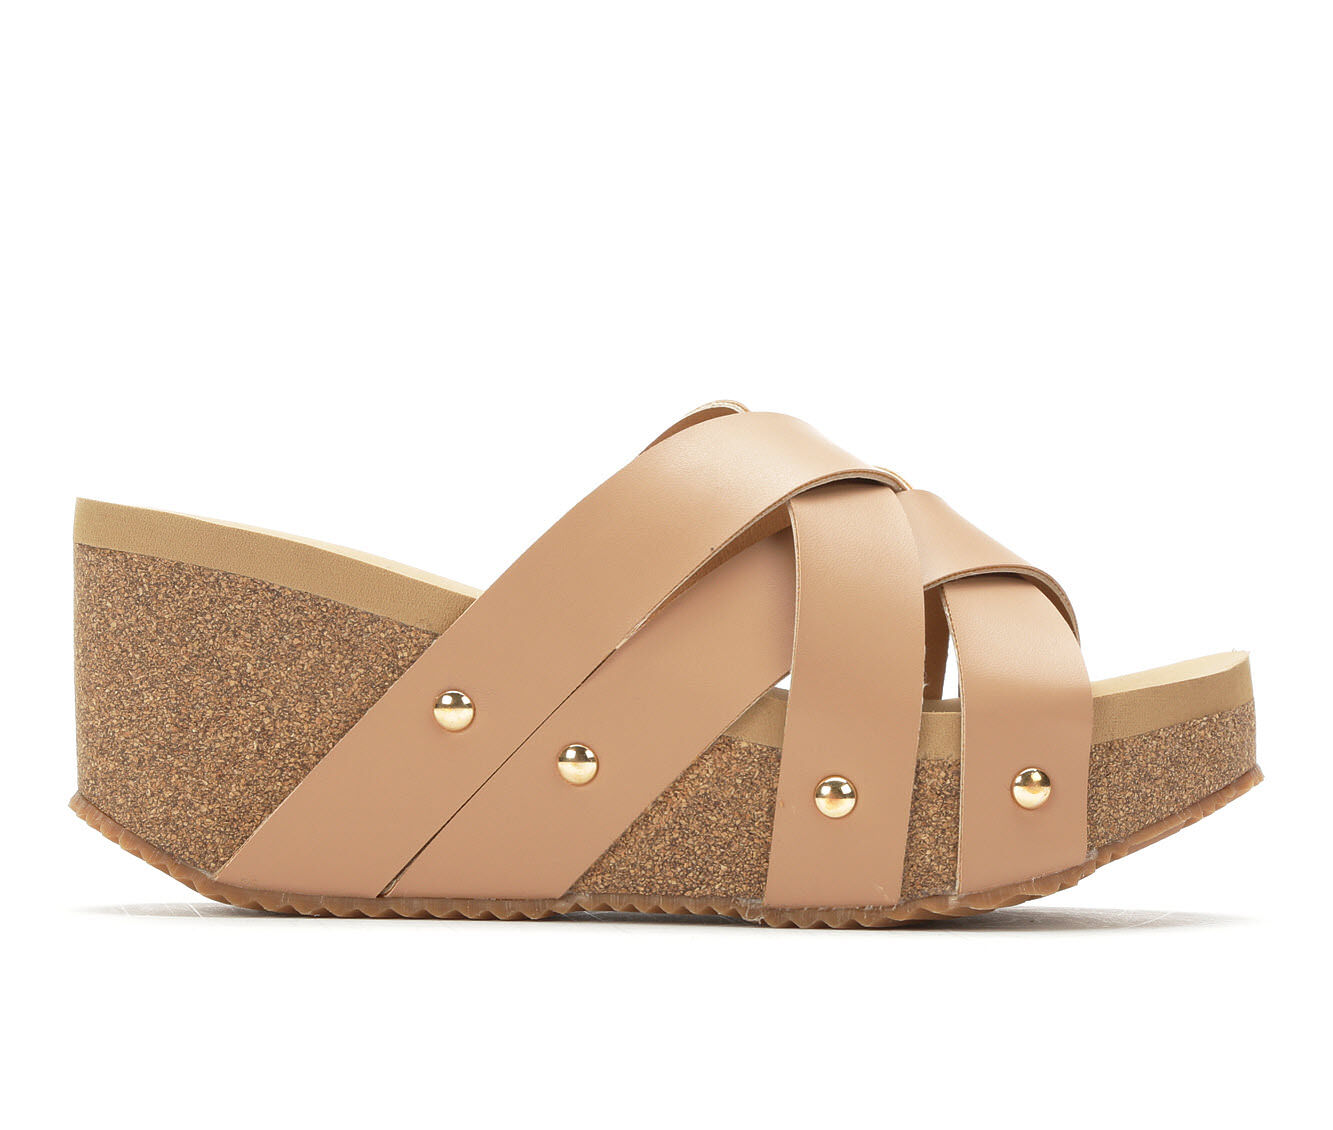 uk shoes_kd6848